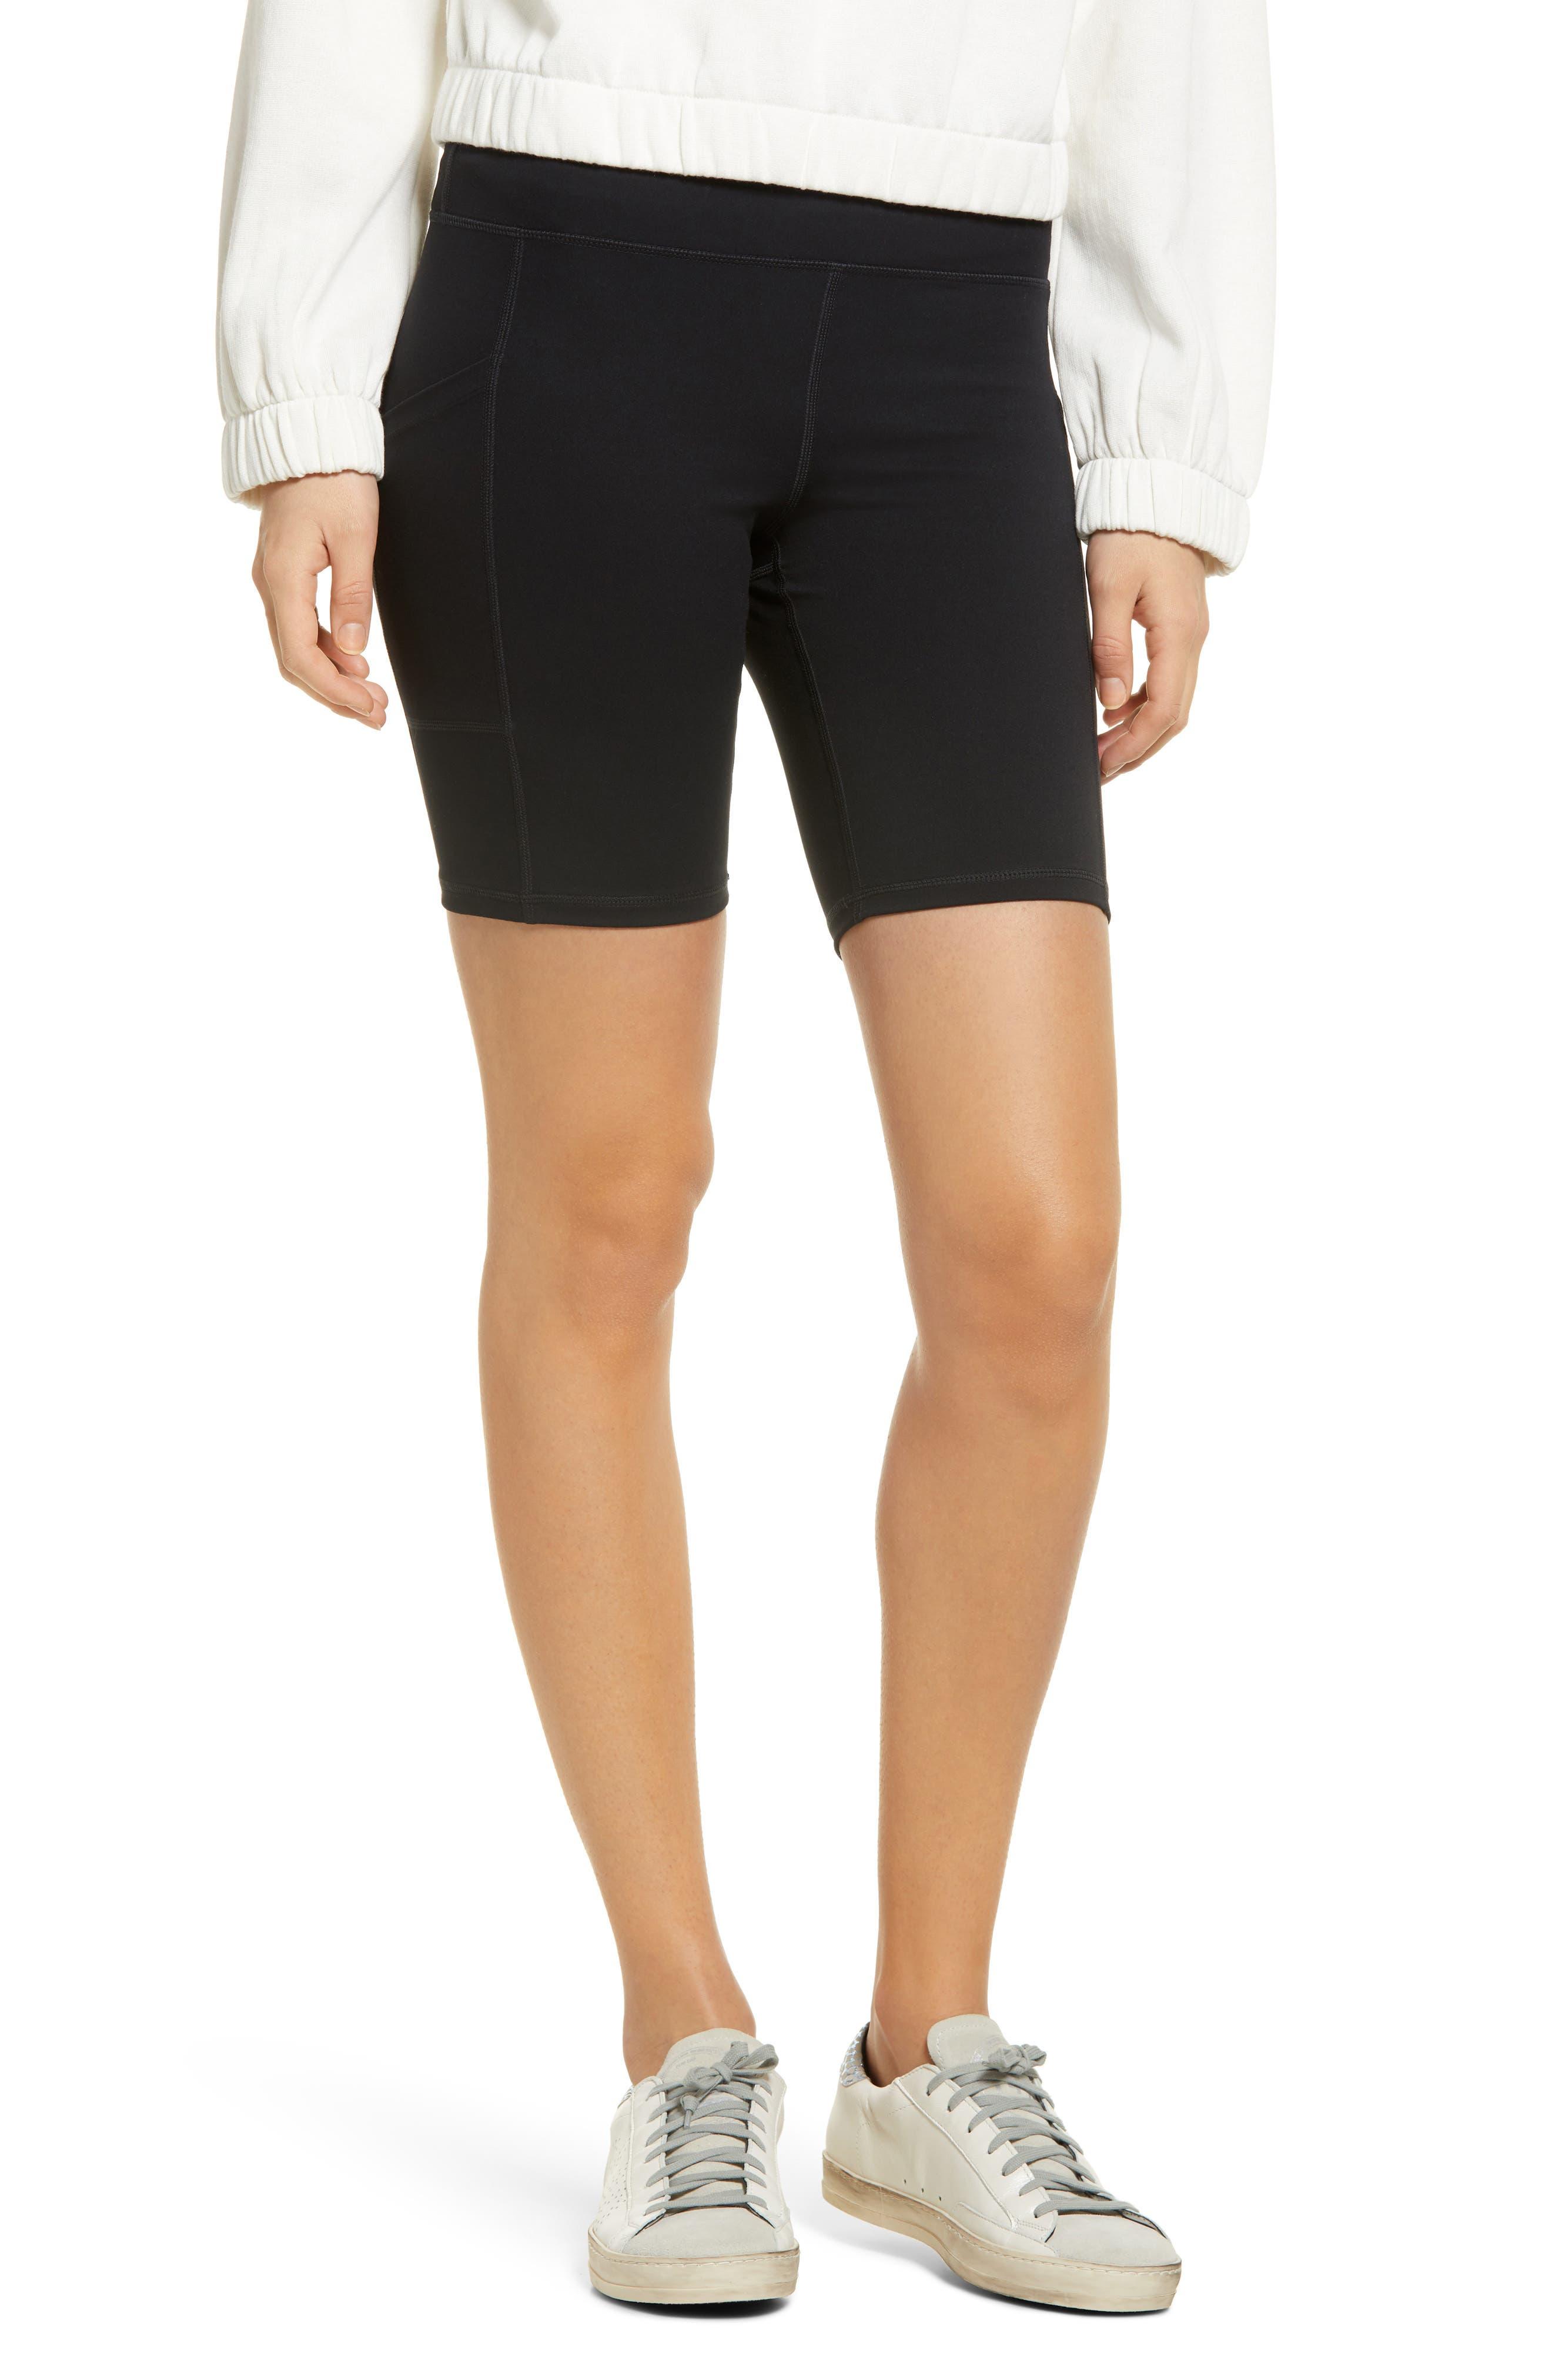 Women's Active Pep Talking Pocket Performance Bike Shorts